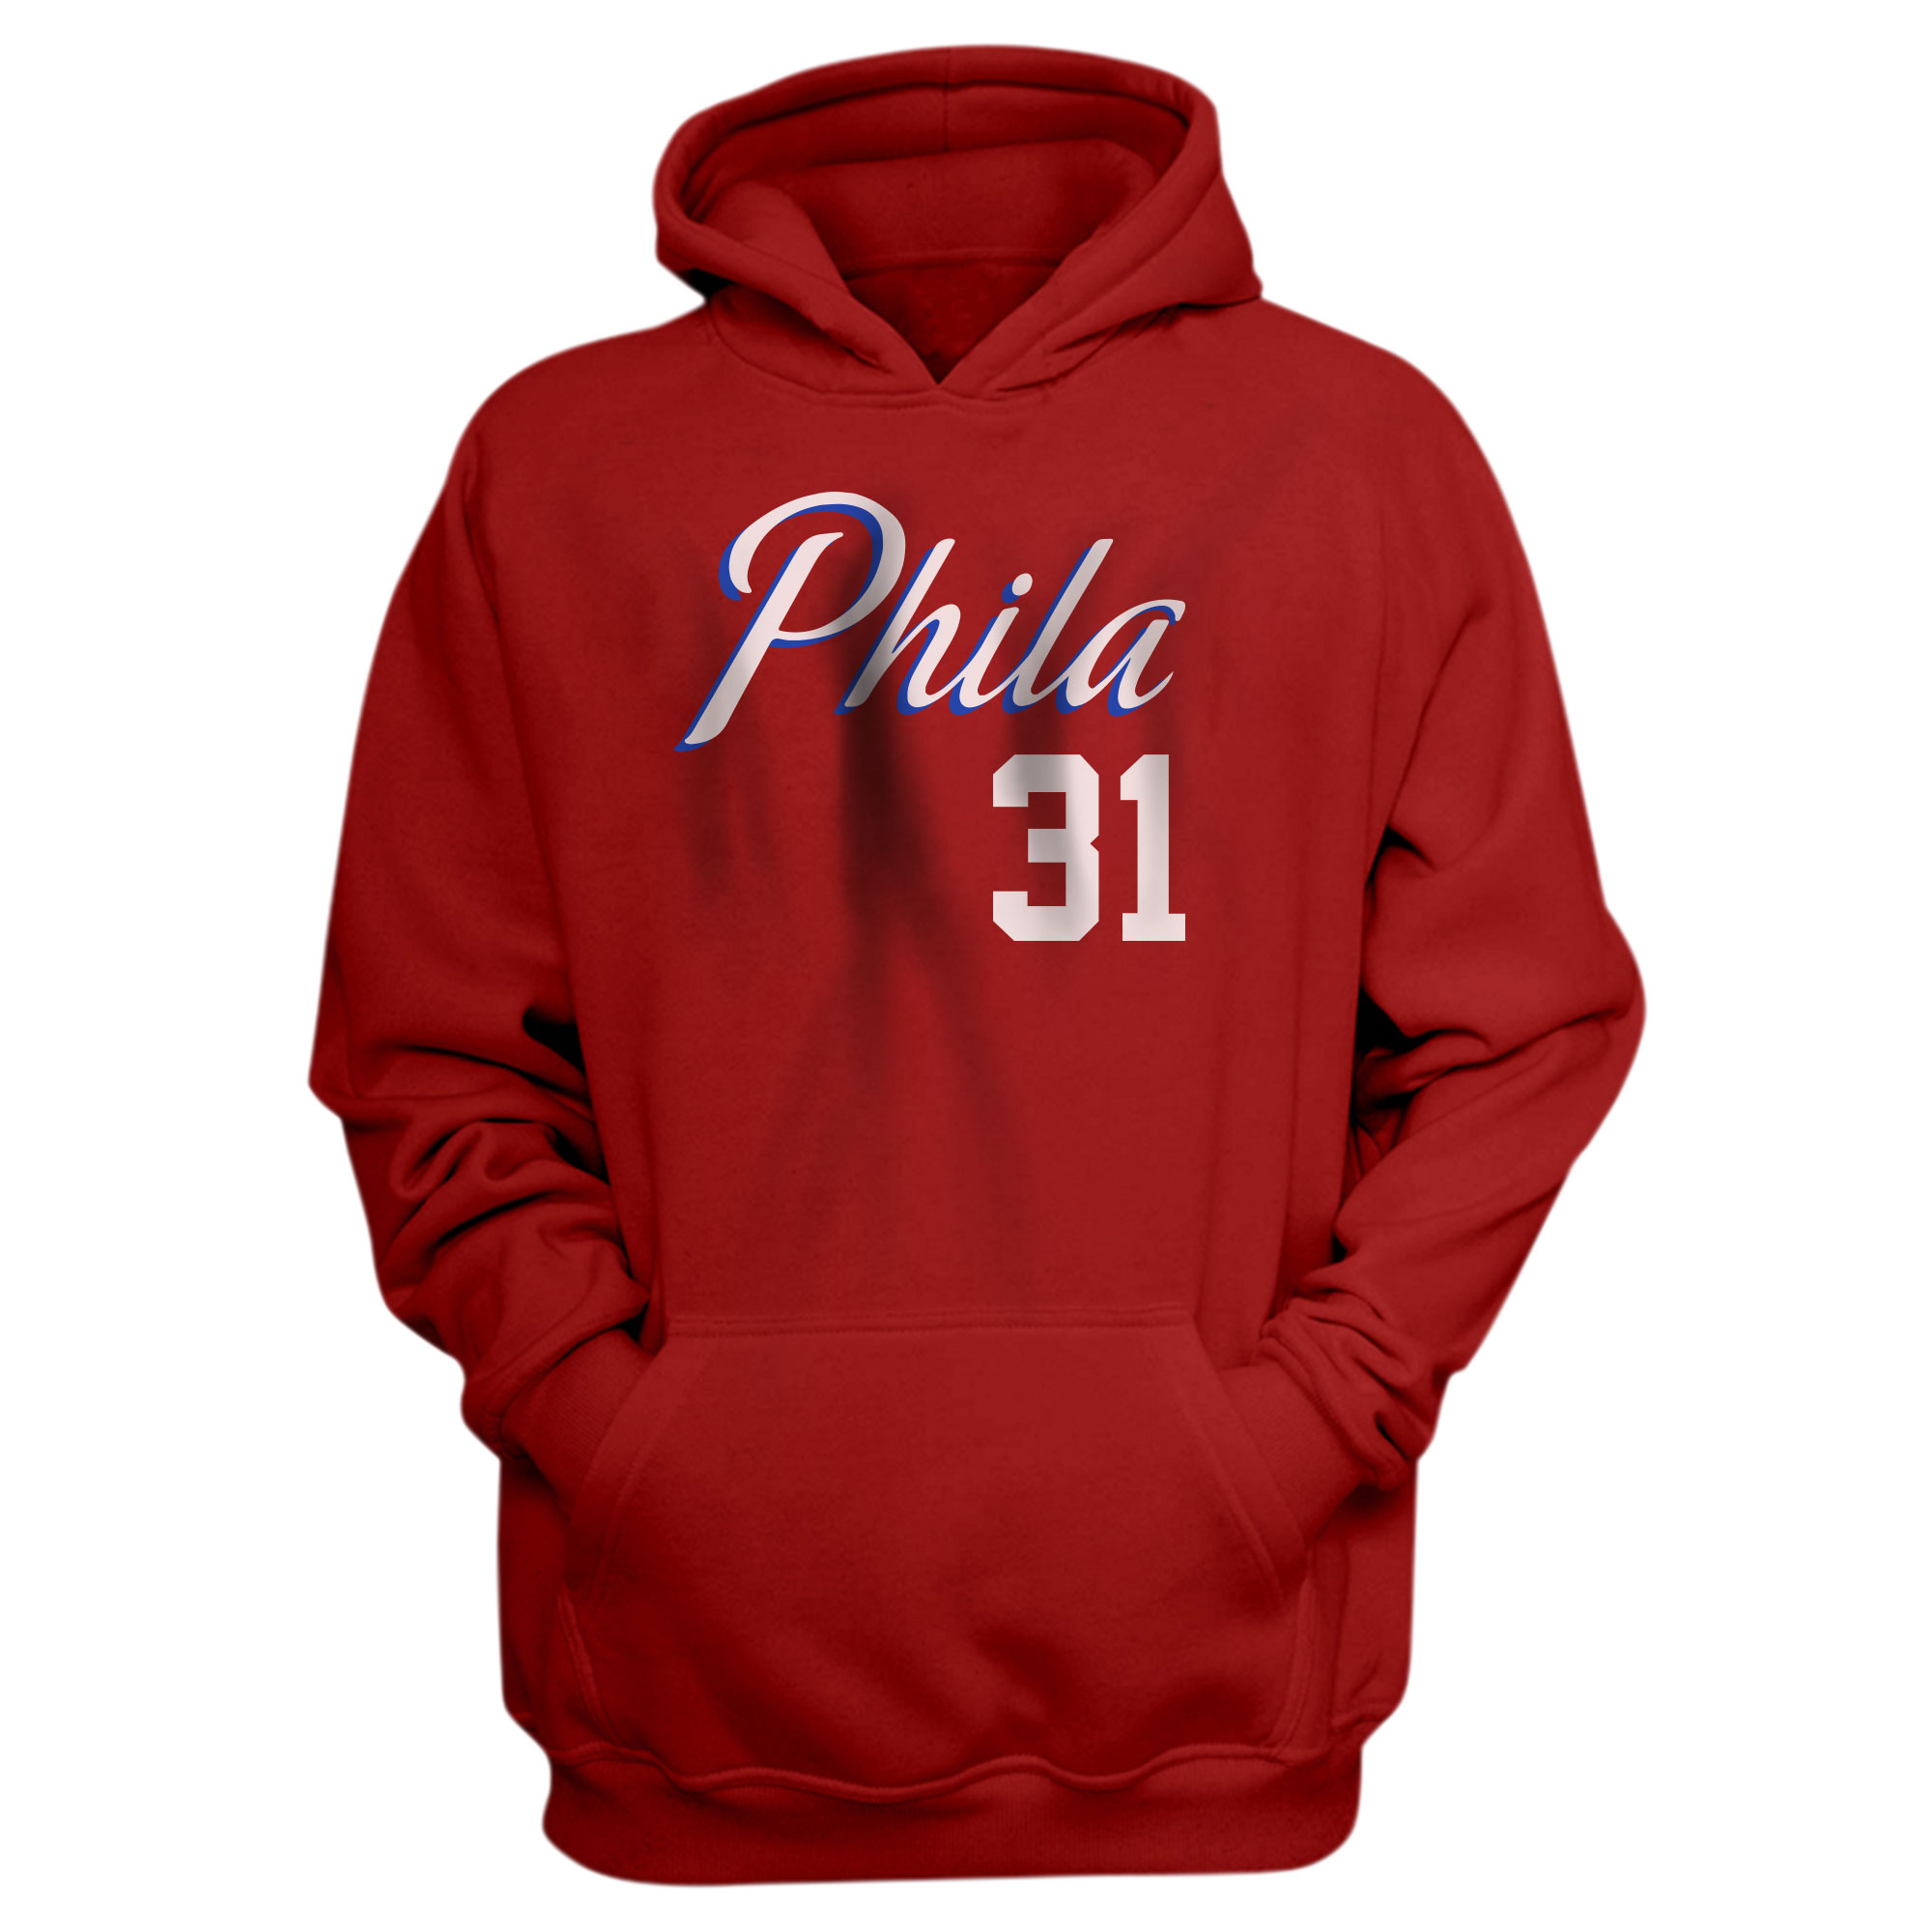 Philadelphia 76ers Seth Curry  Hoodie (HD-RED-NP-504-31)